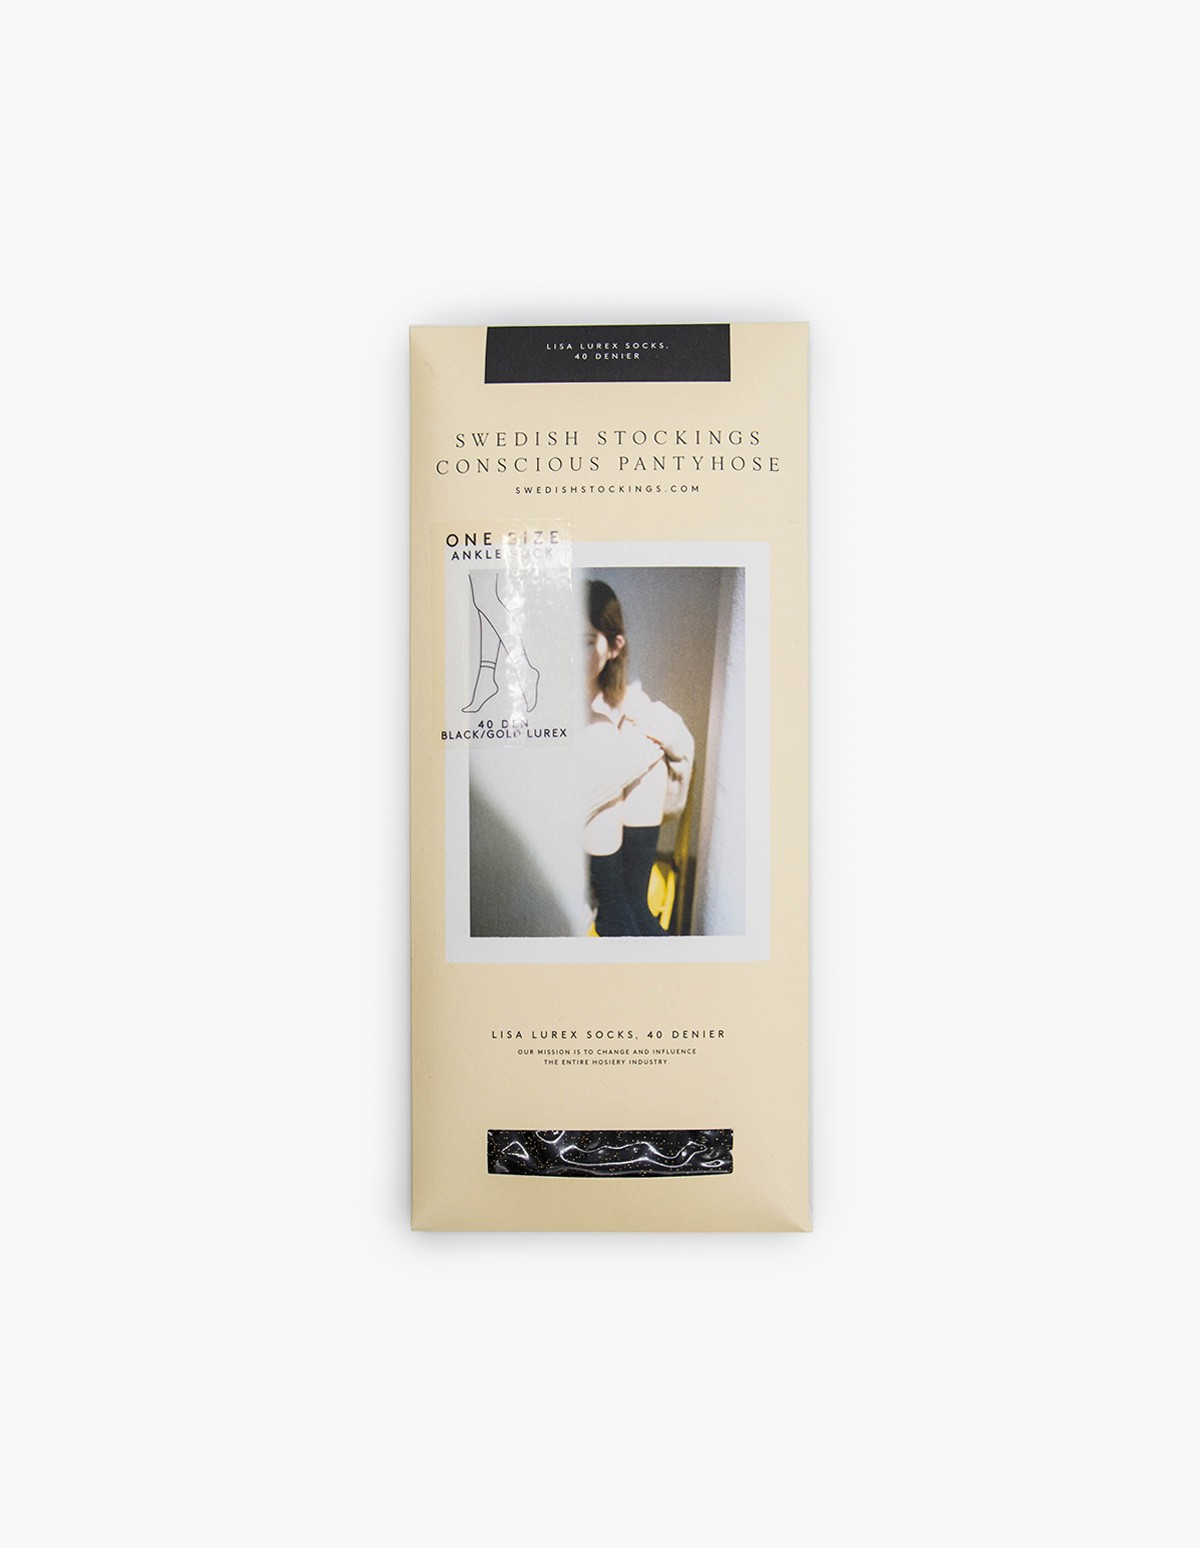 Swedish Stockings Lisa Socks in Black / Gold